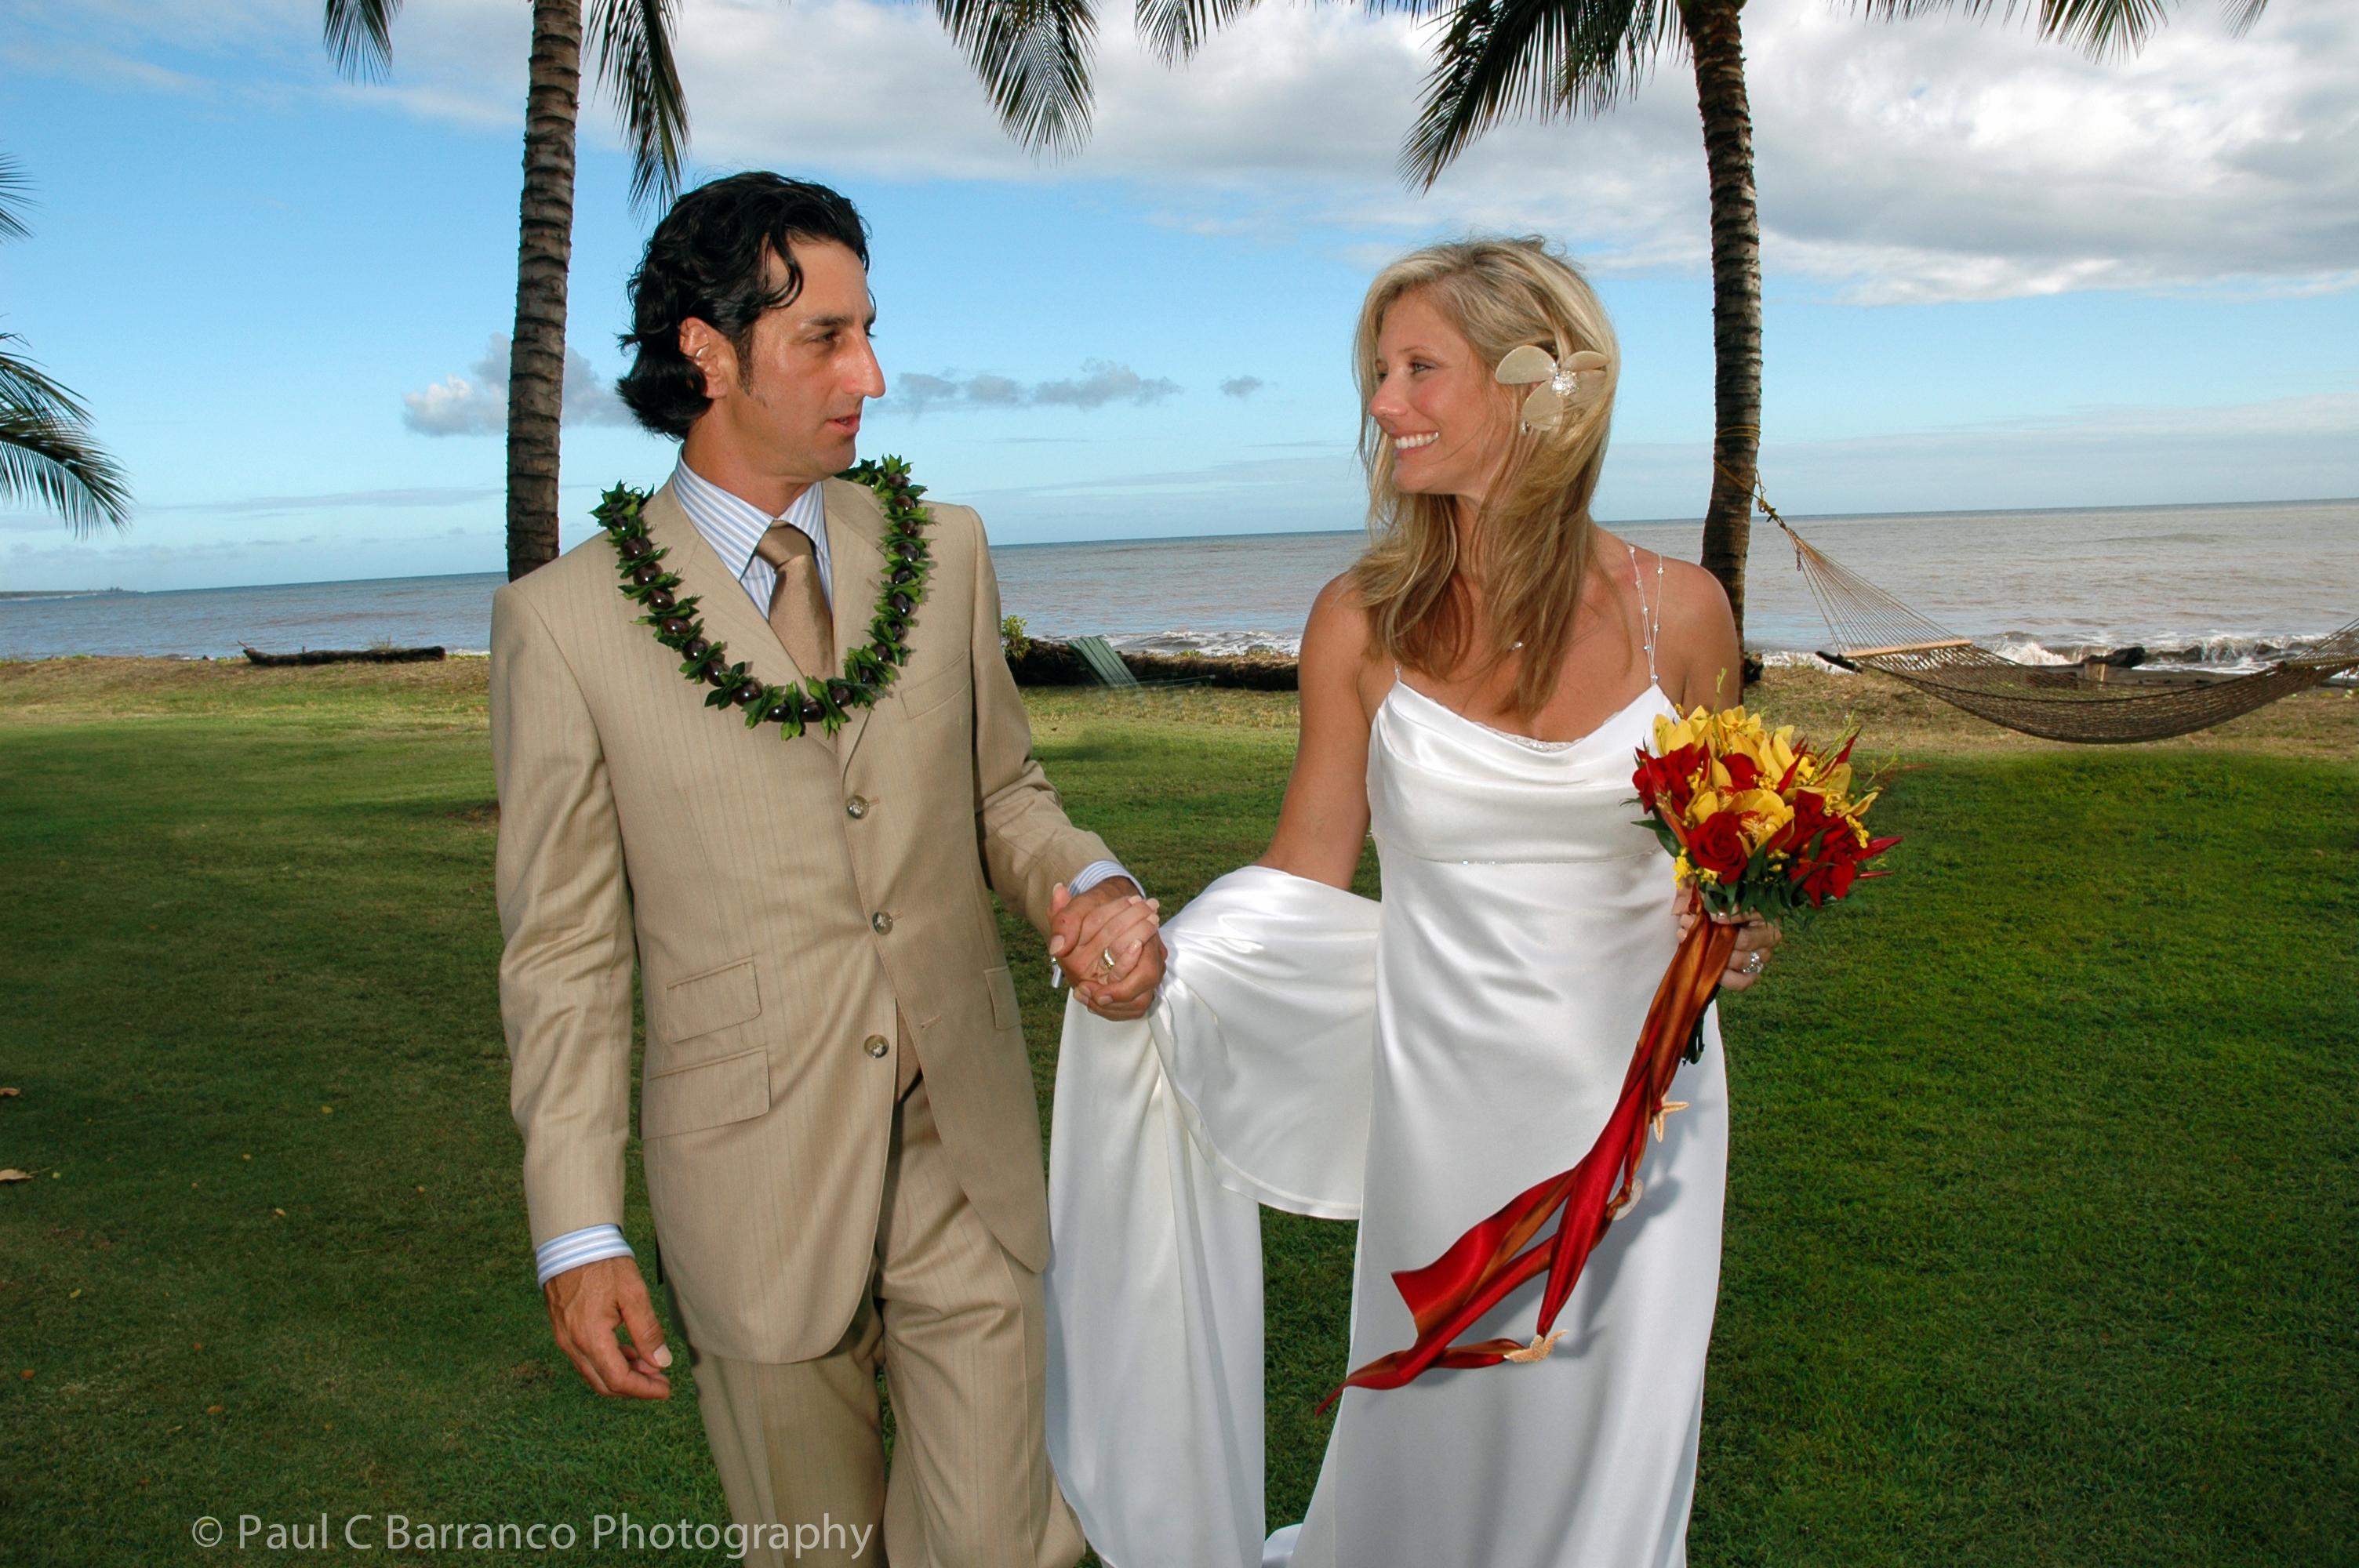 wedding_Port_PCB-4.jpg